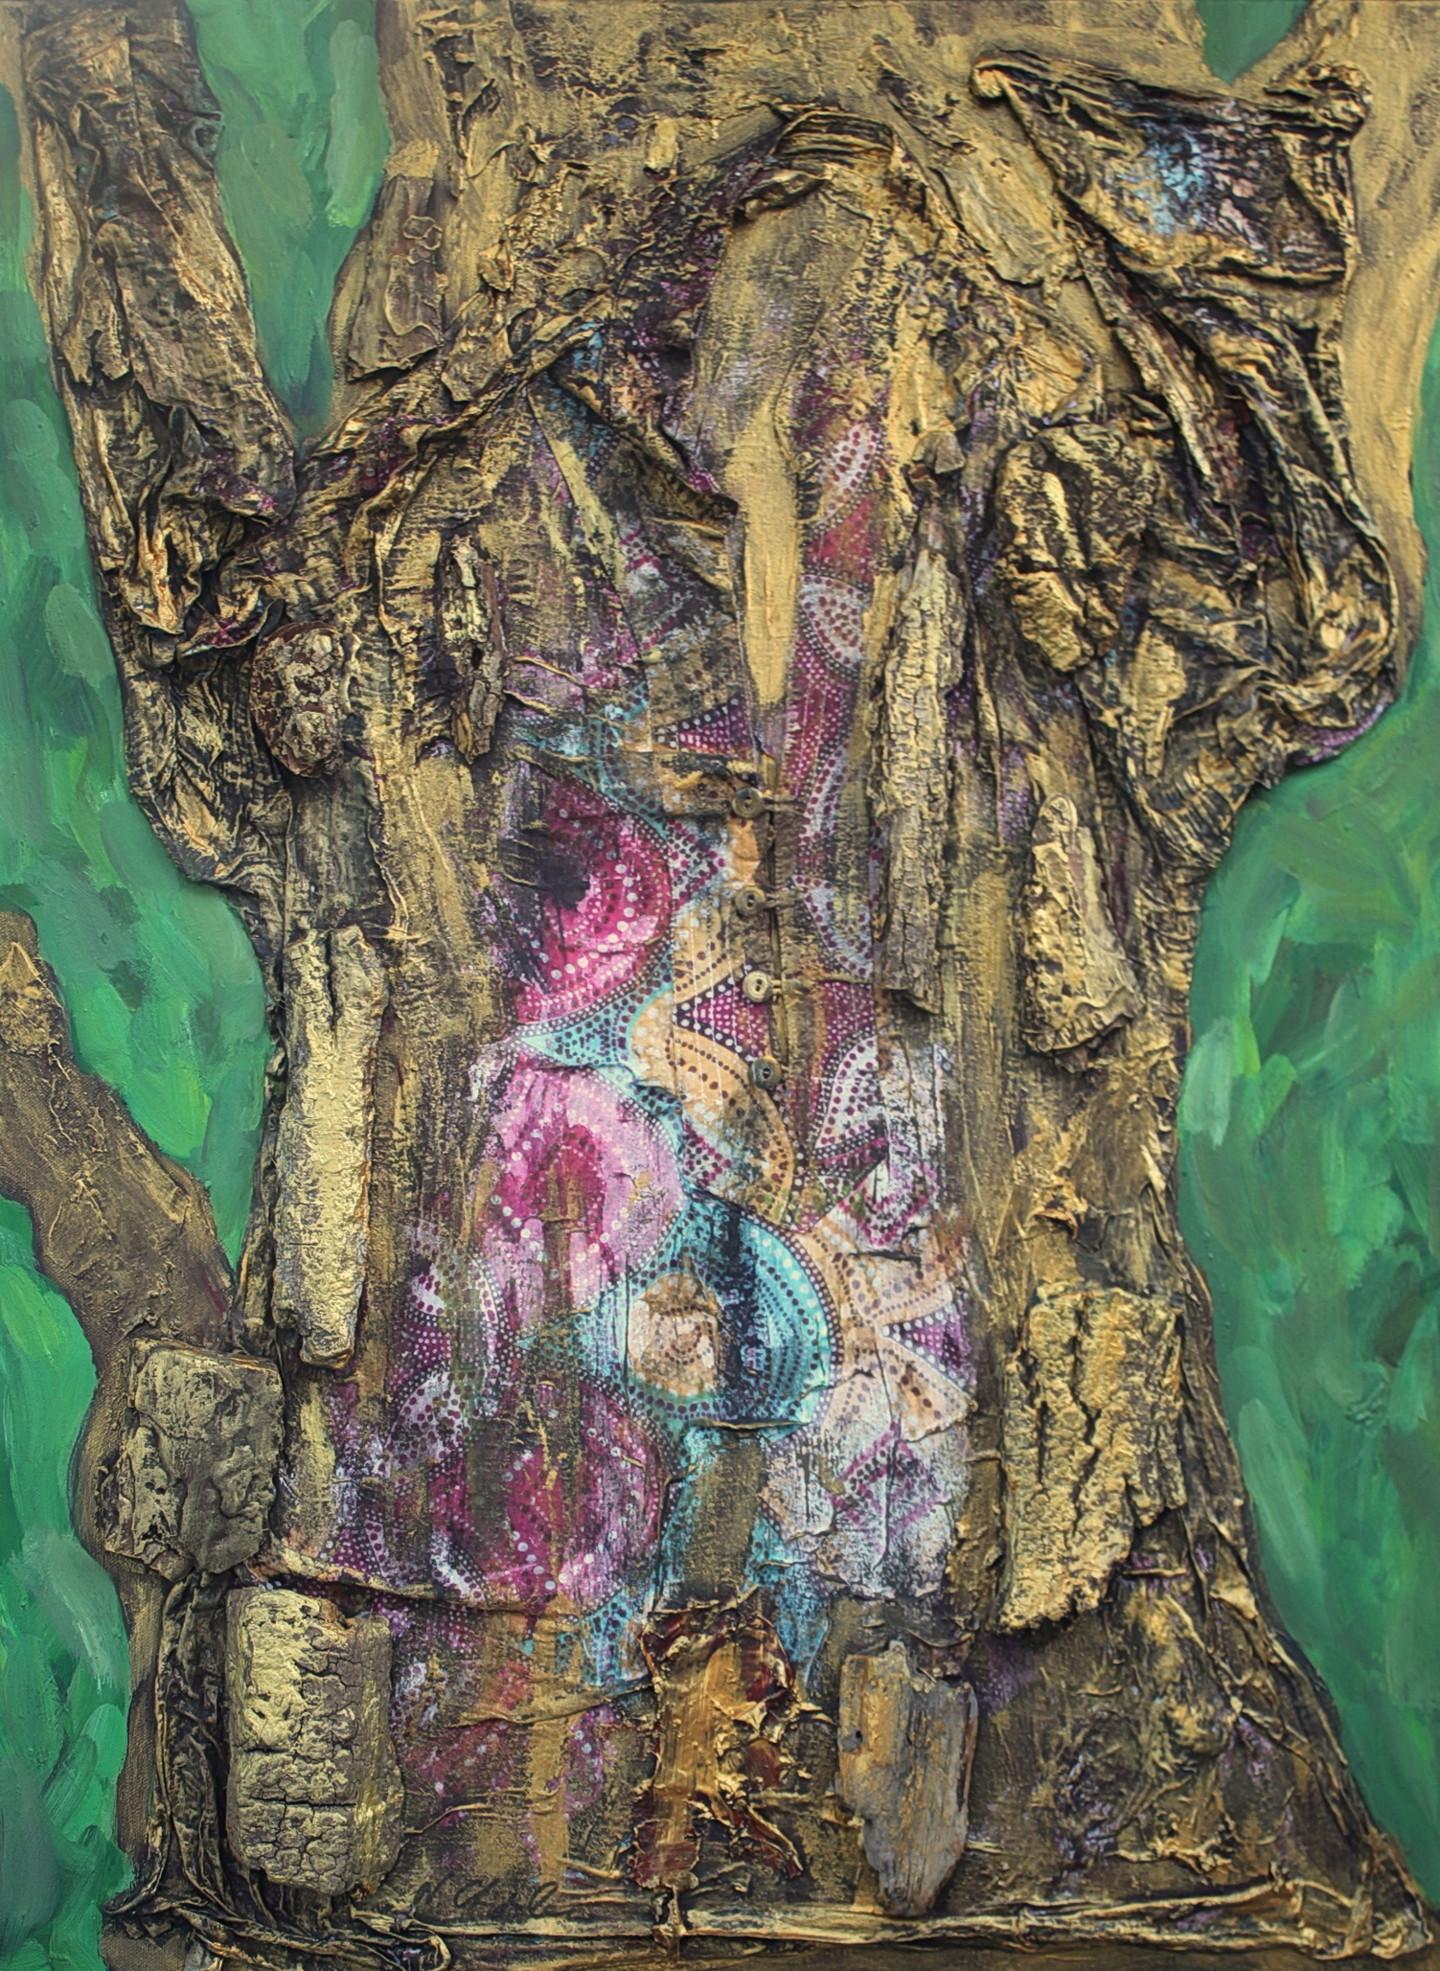 Nath Chipilova (Atelier NN art store) - Golden Shirt Tree Part 4